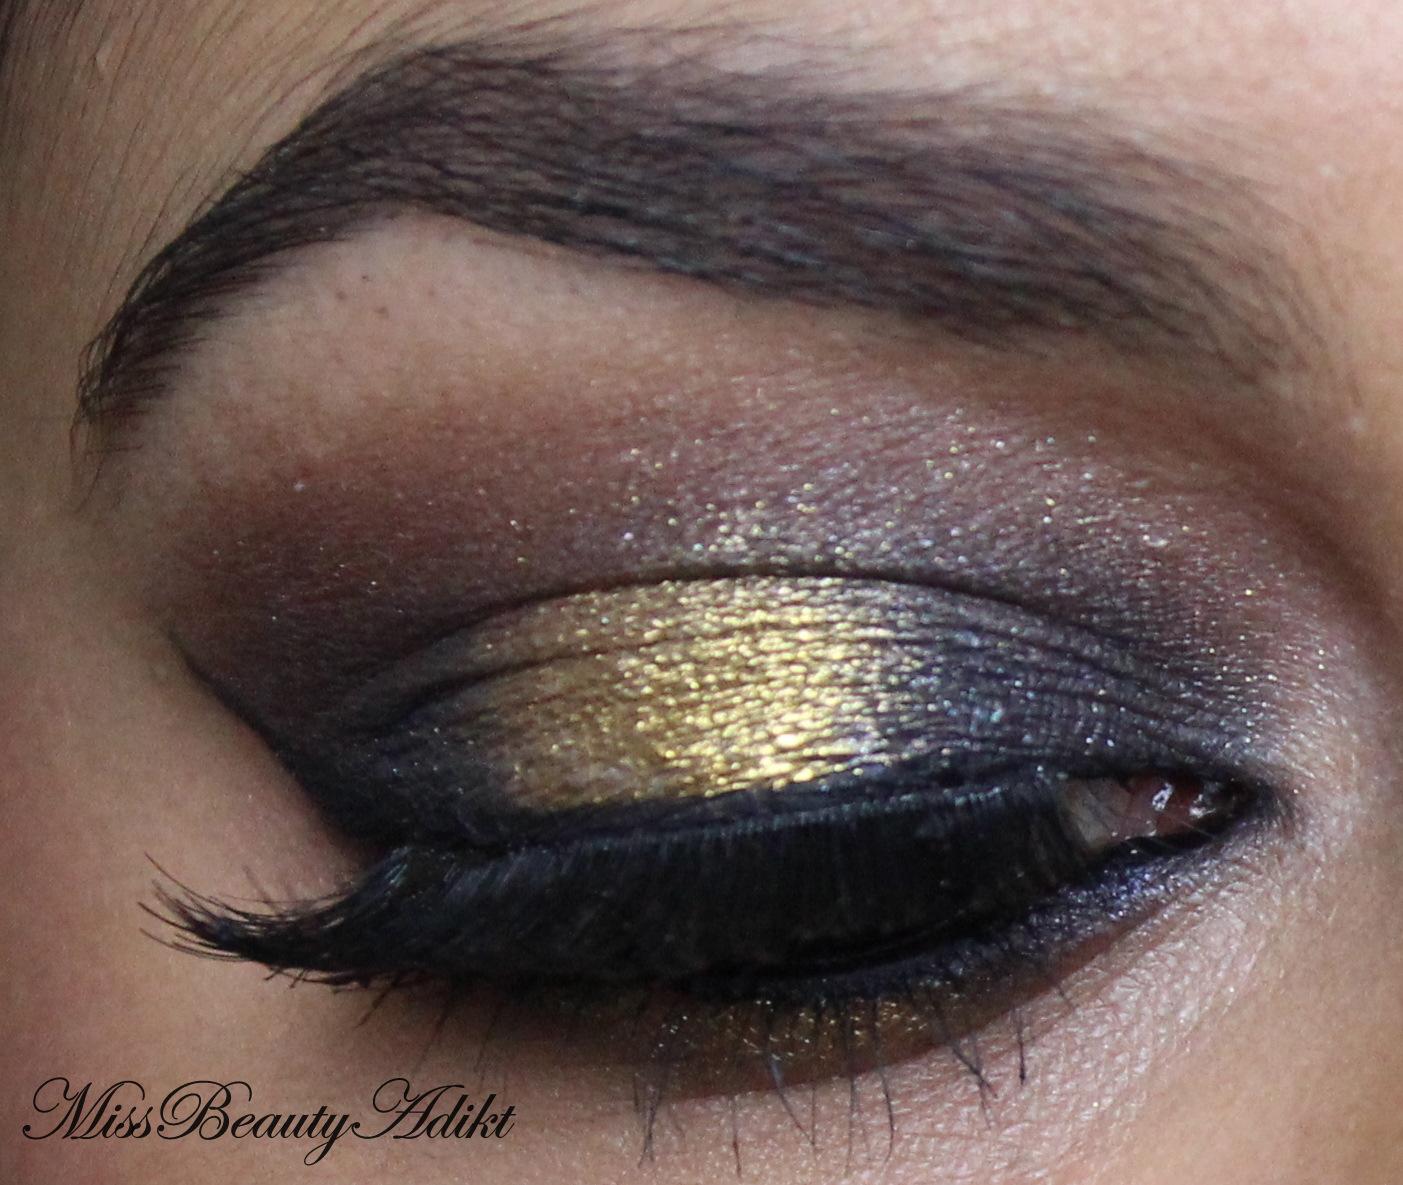 M I S S B E A U T Y A D I K T Black Amp Gold Smokey Eye Makeup